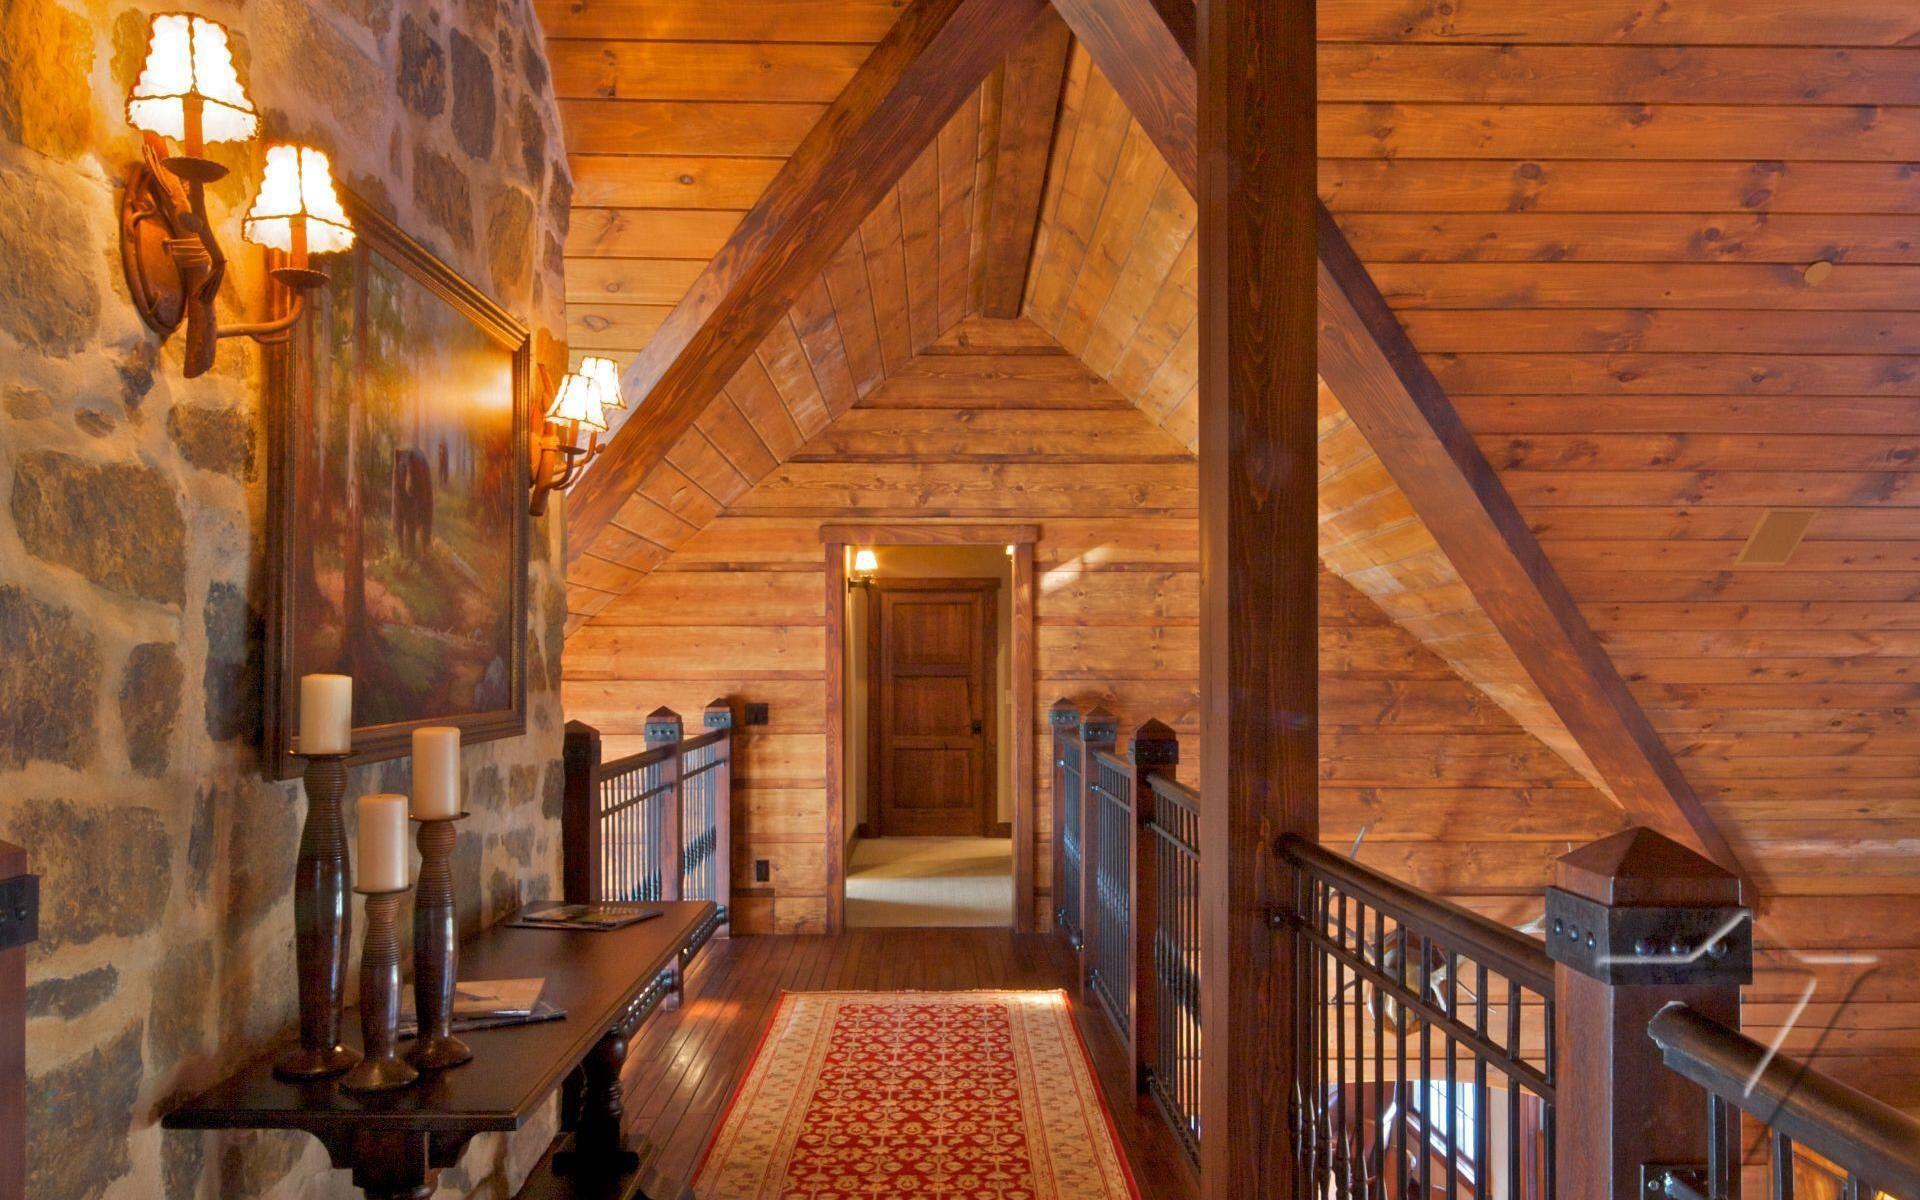 http://www.ikh.villas/en/rentals/this-rustic-mountain-villa-gives